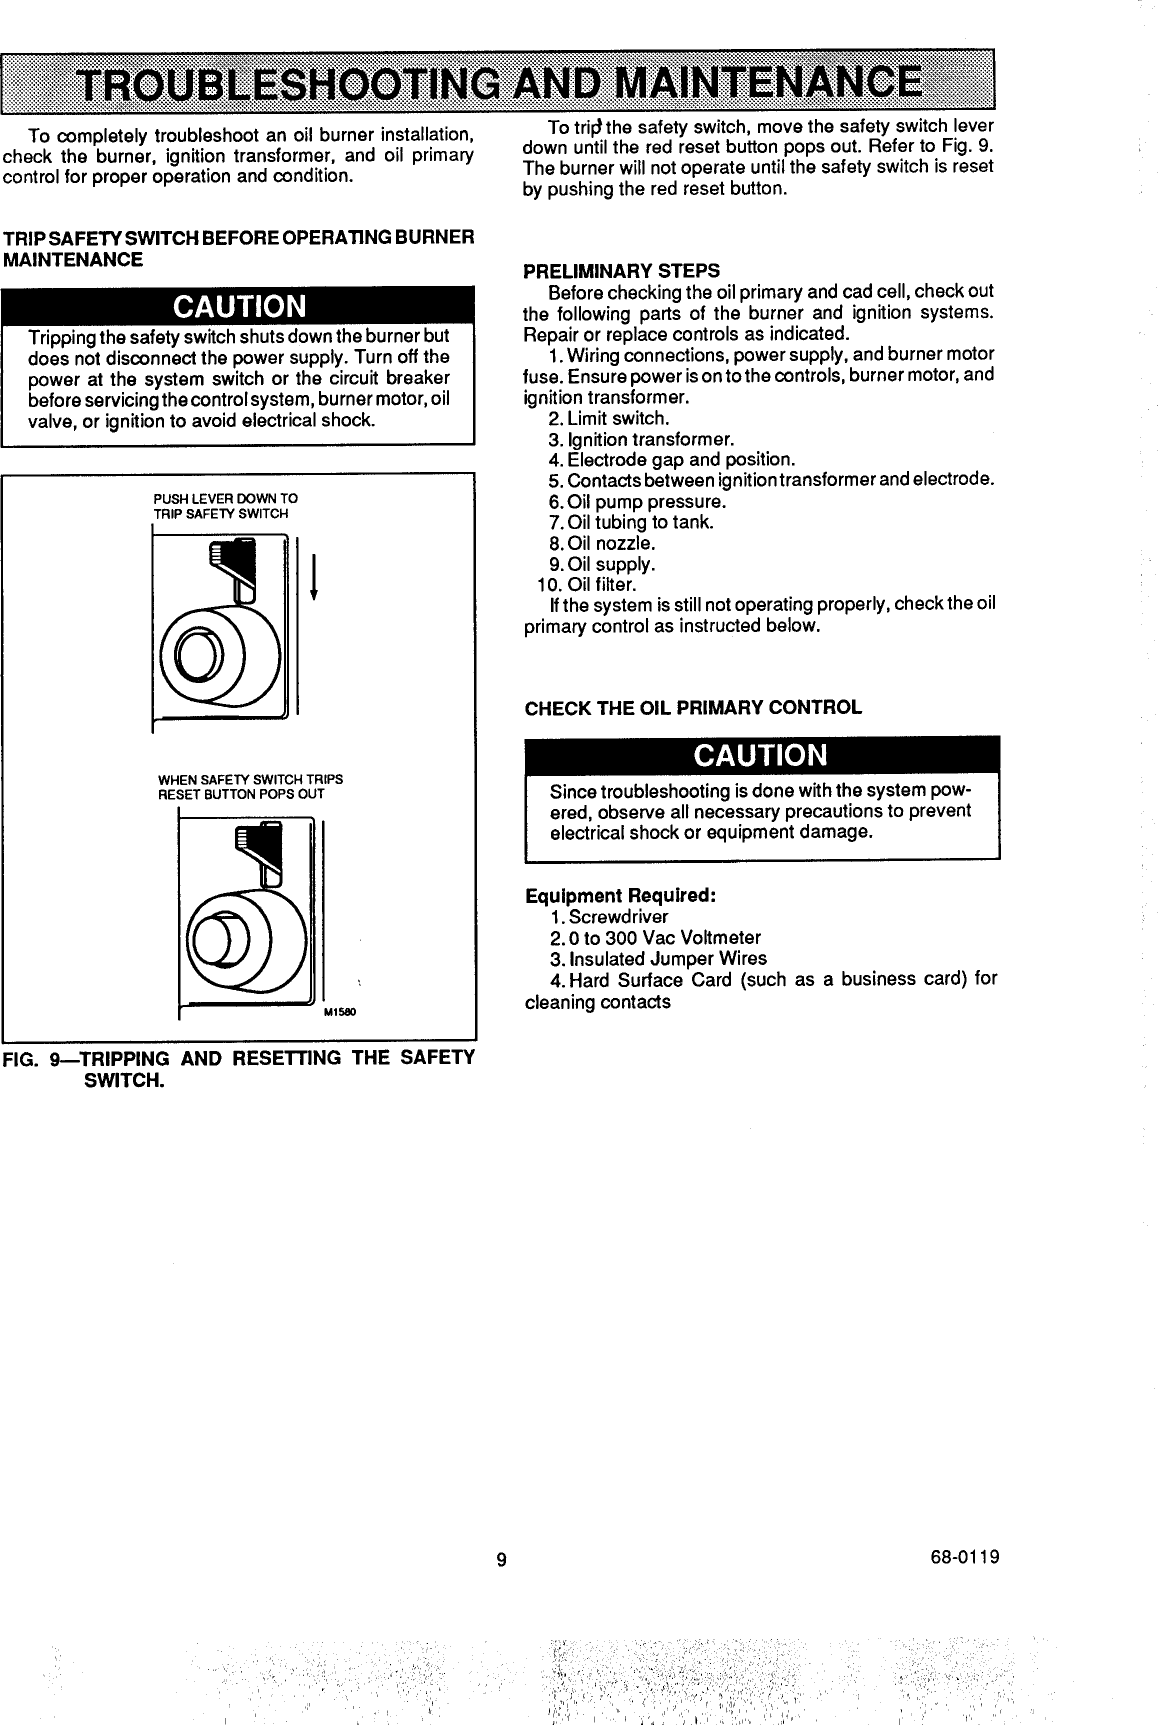 beckett oil burner reset wiring diagram beckett parts Beckett Oil Boiler Parts Beckett Oil Furnace Parts